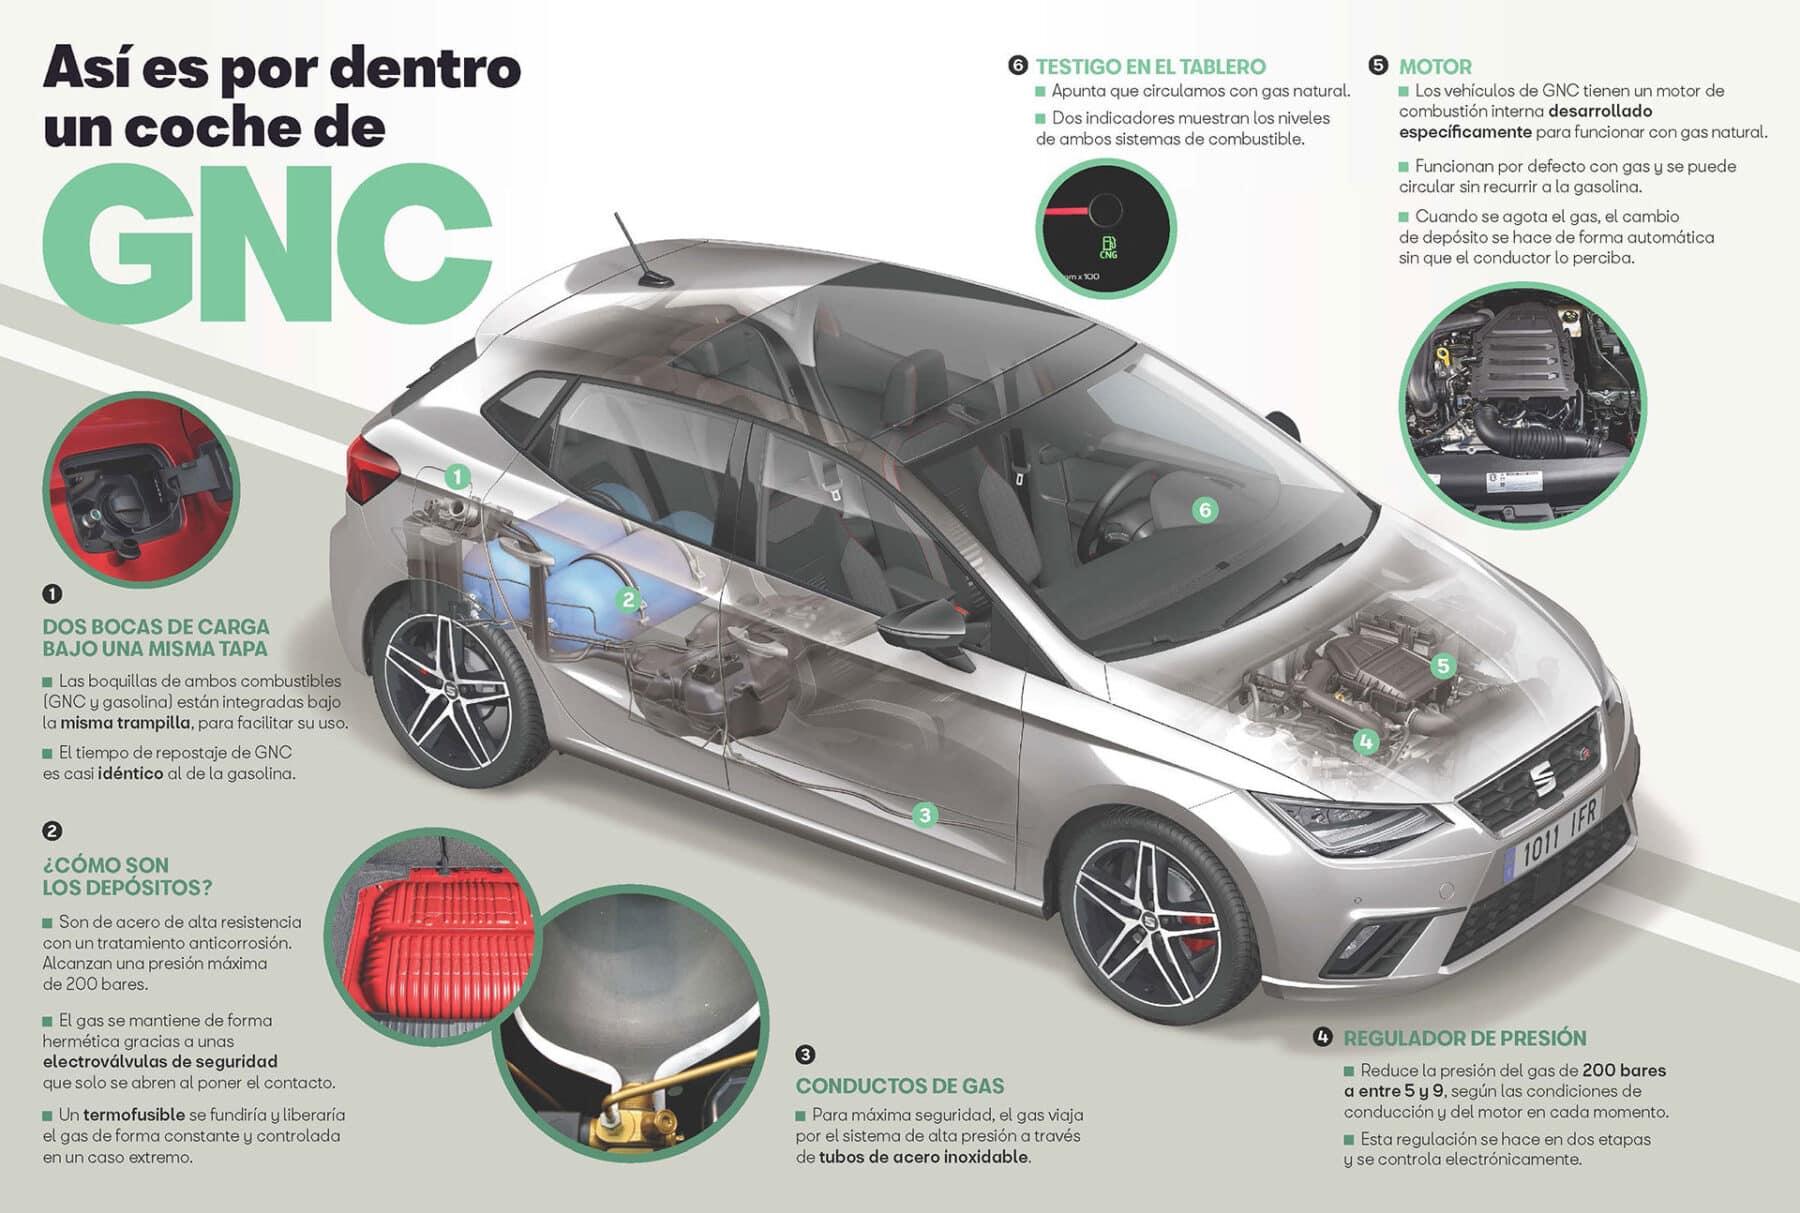 Resumen del coche GNC ECO